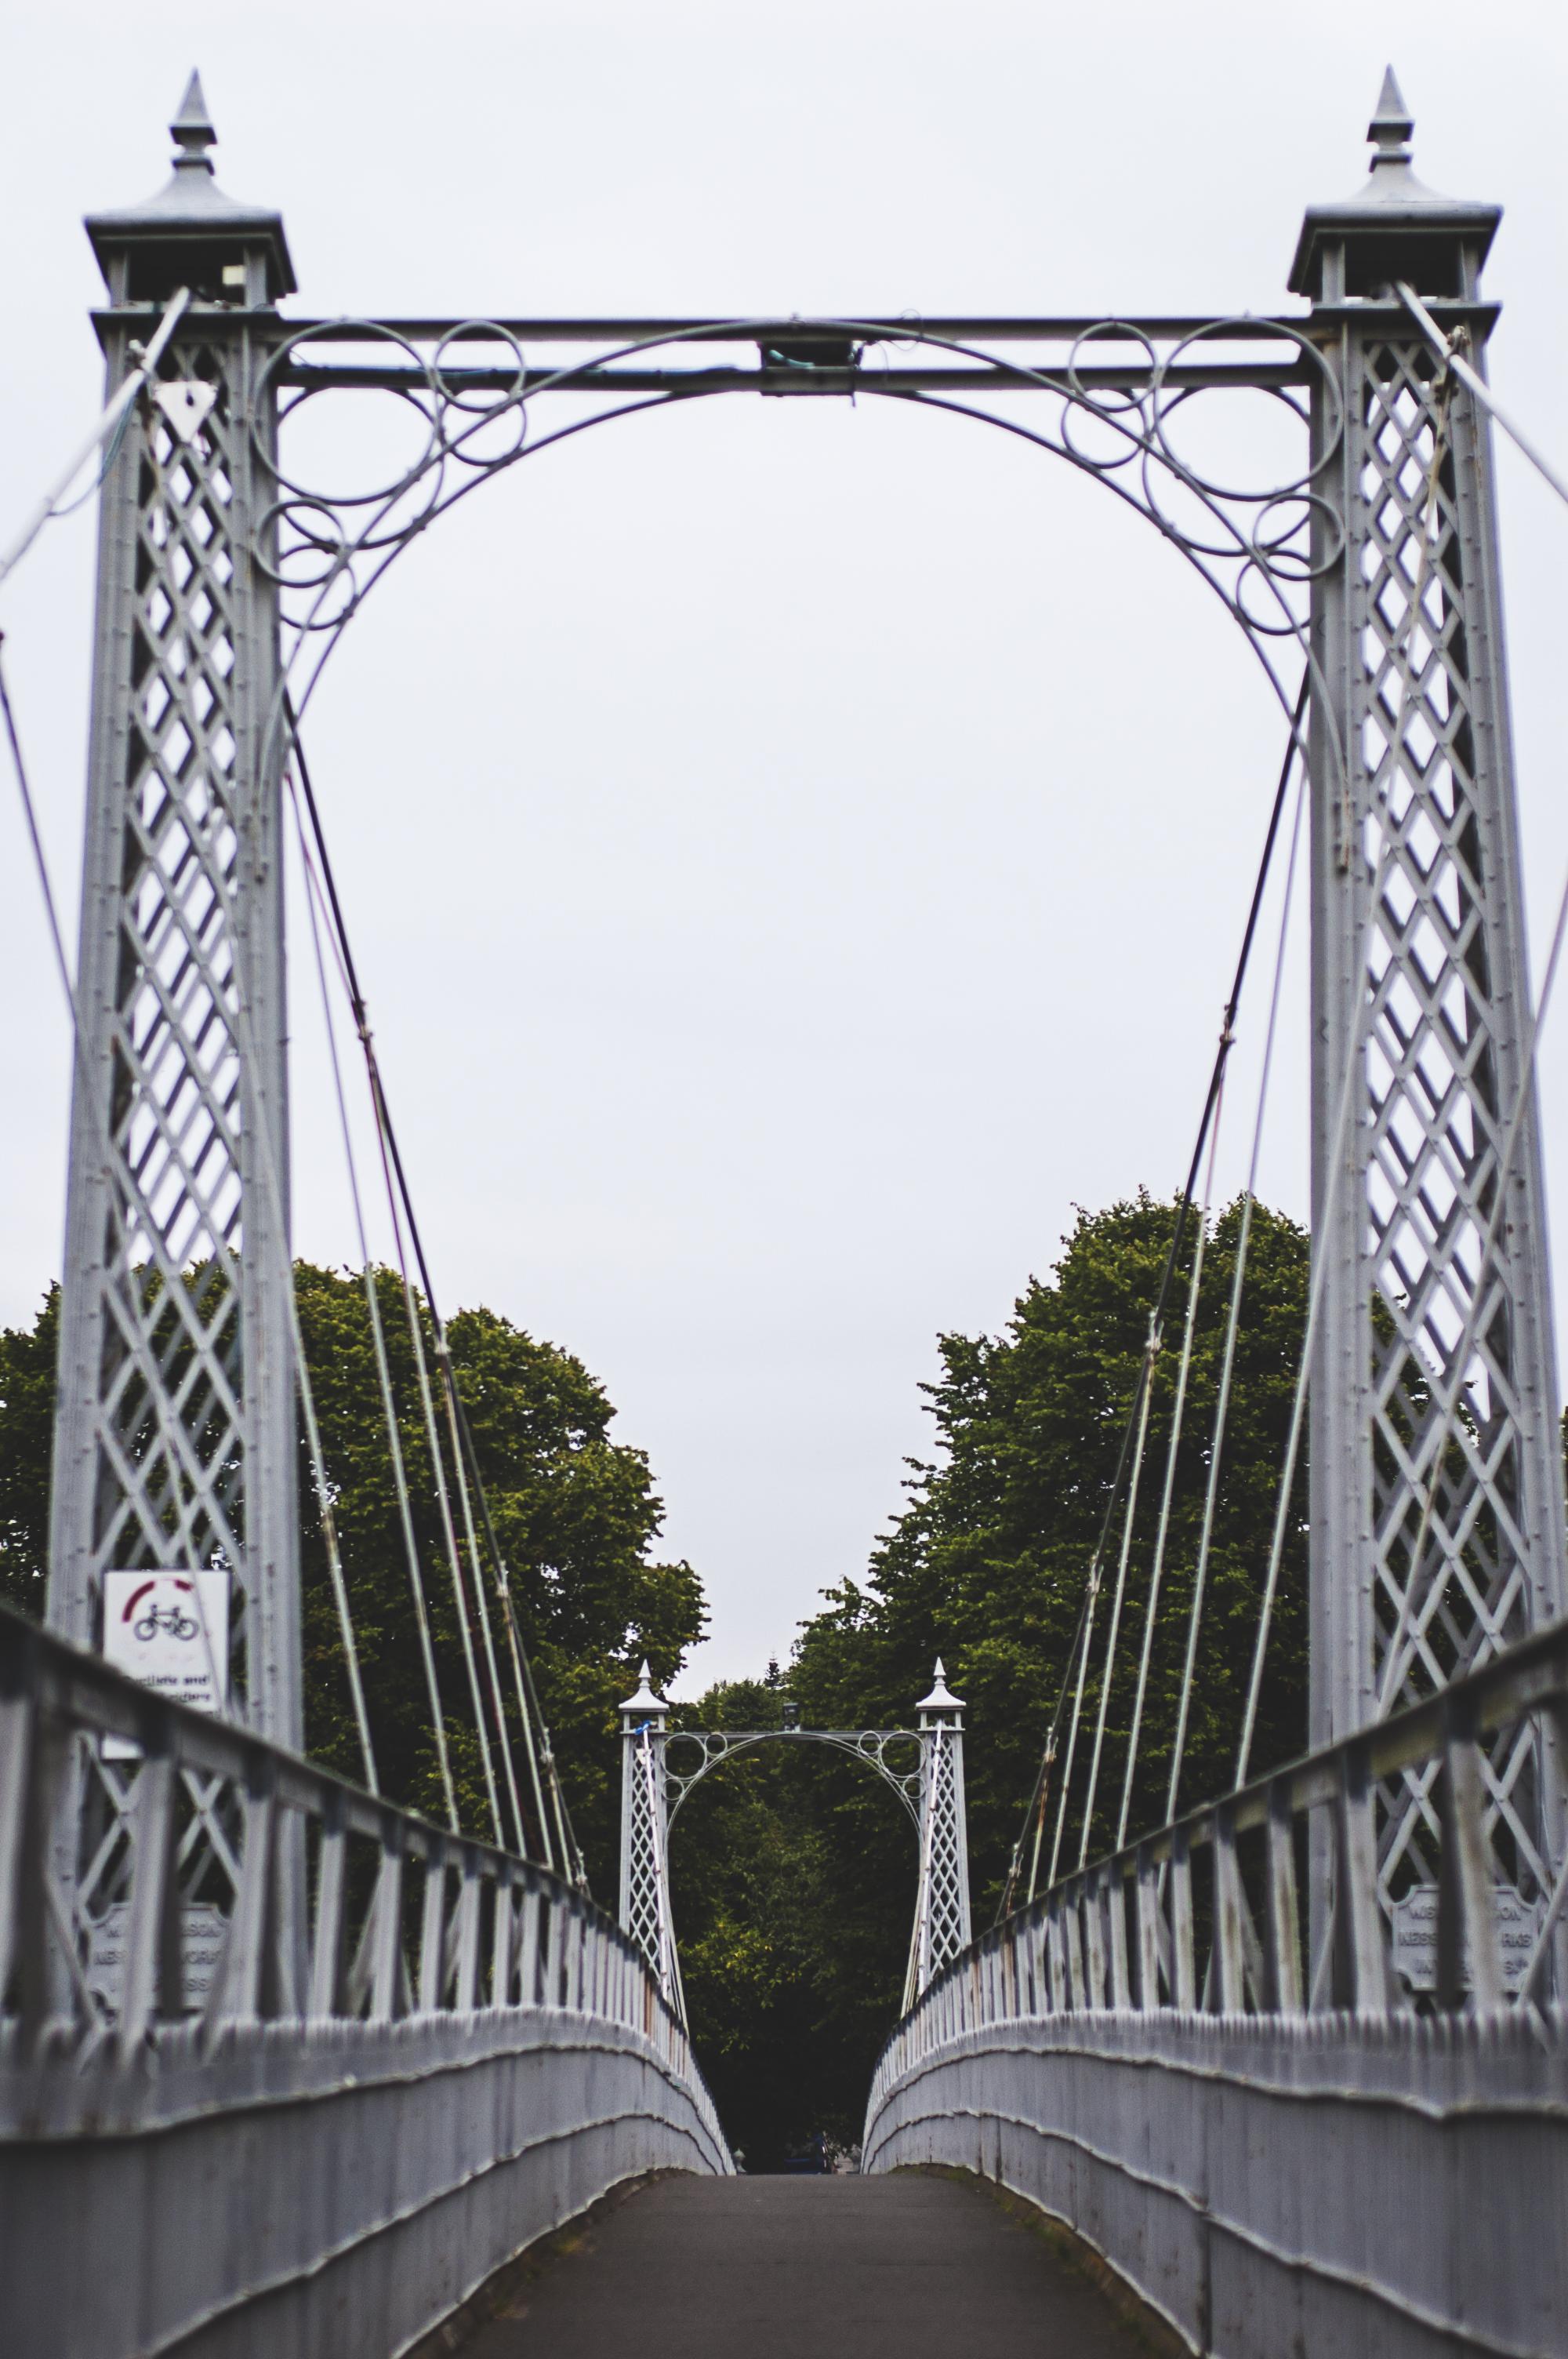 Crossing the Greig Street Bridge in Inverness